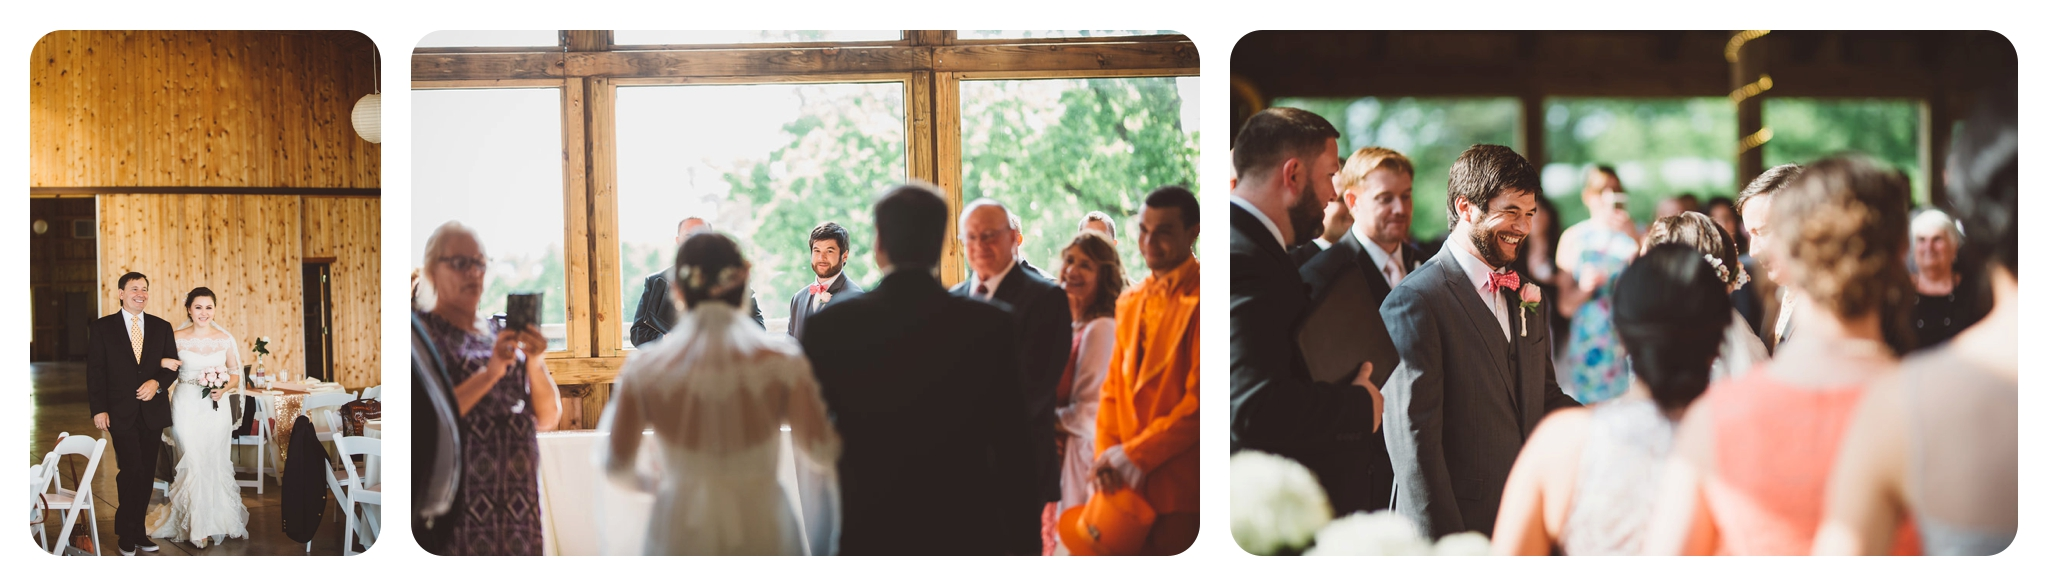 Braeloch-Weddings-Wedding-Photographer-Pat-Cori-Photography-019.jpg